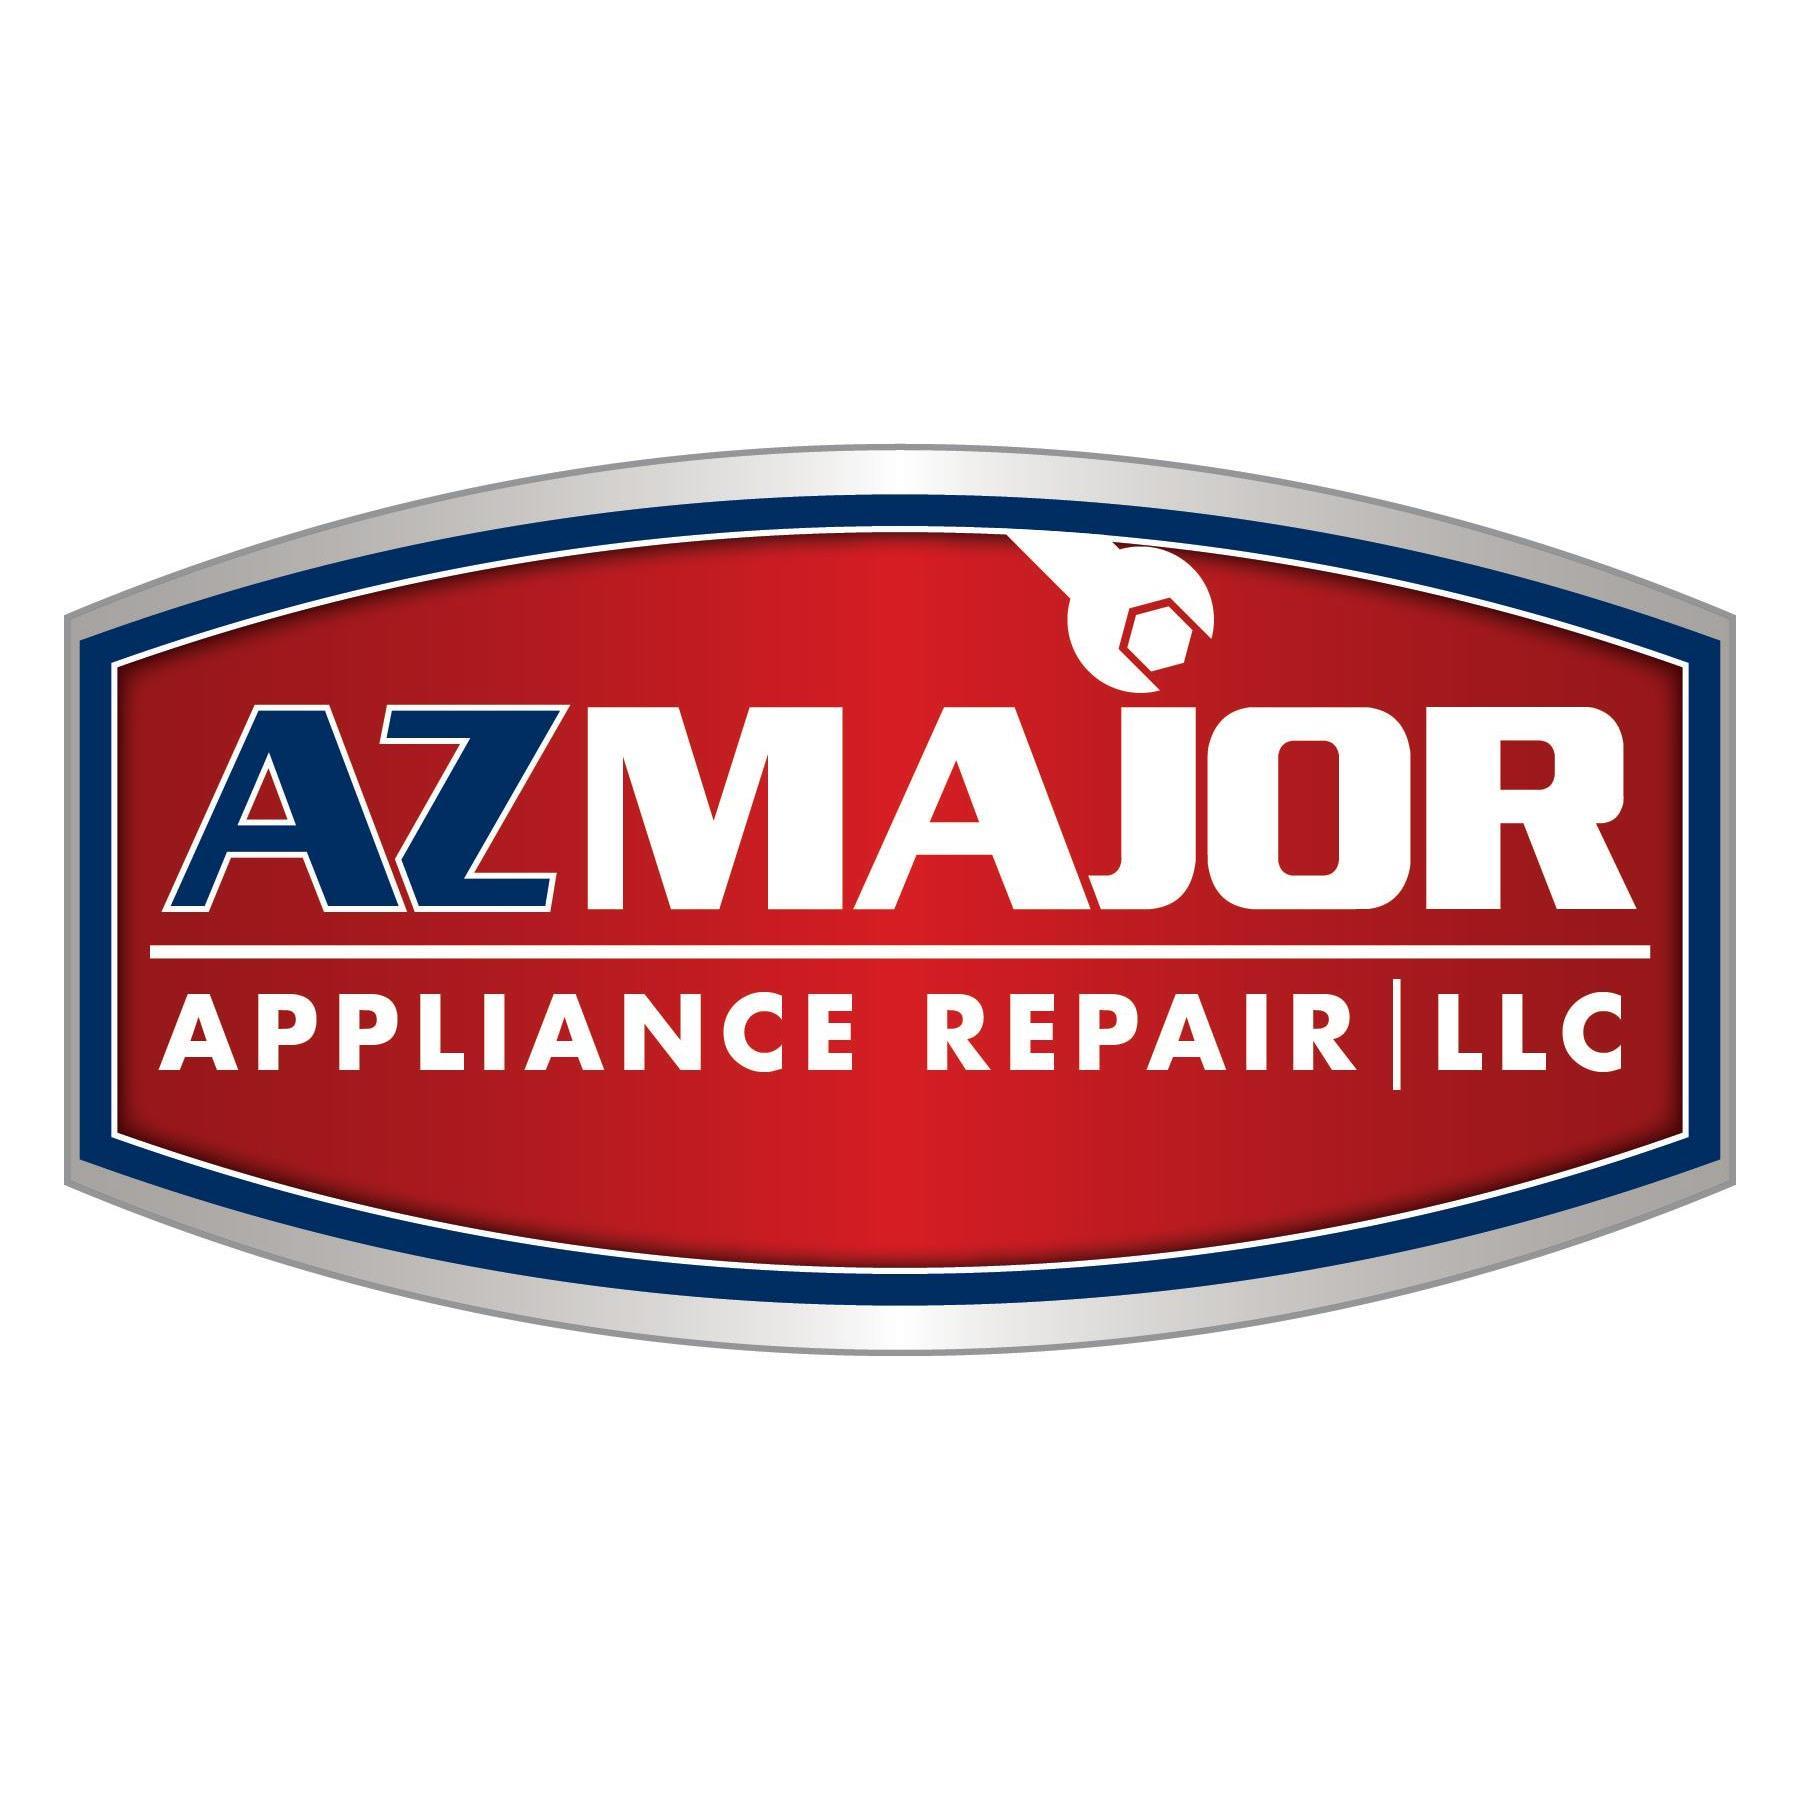 AZ Major Appliance Repair, LLC image 0